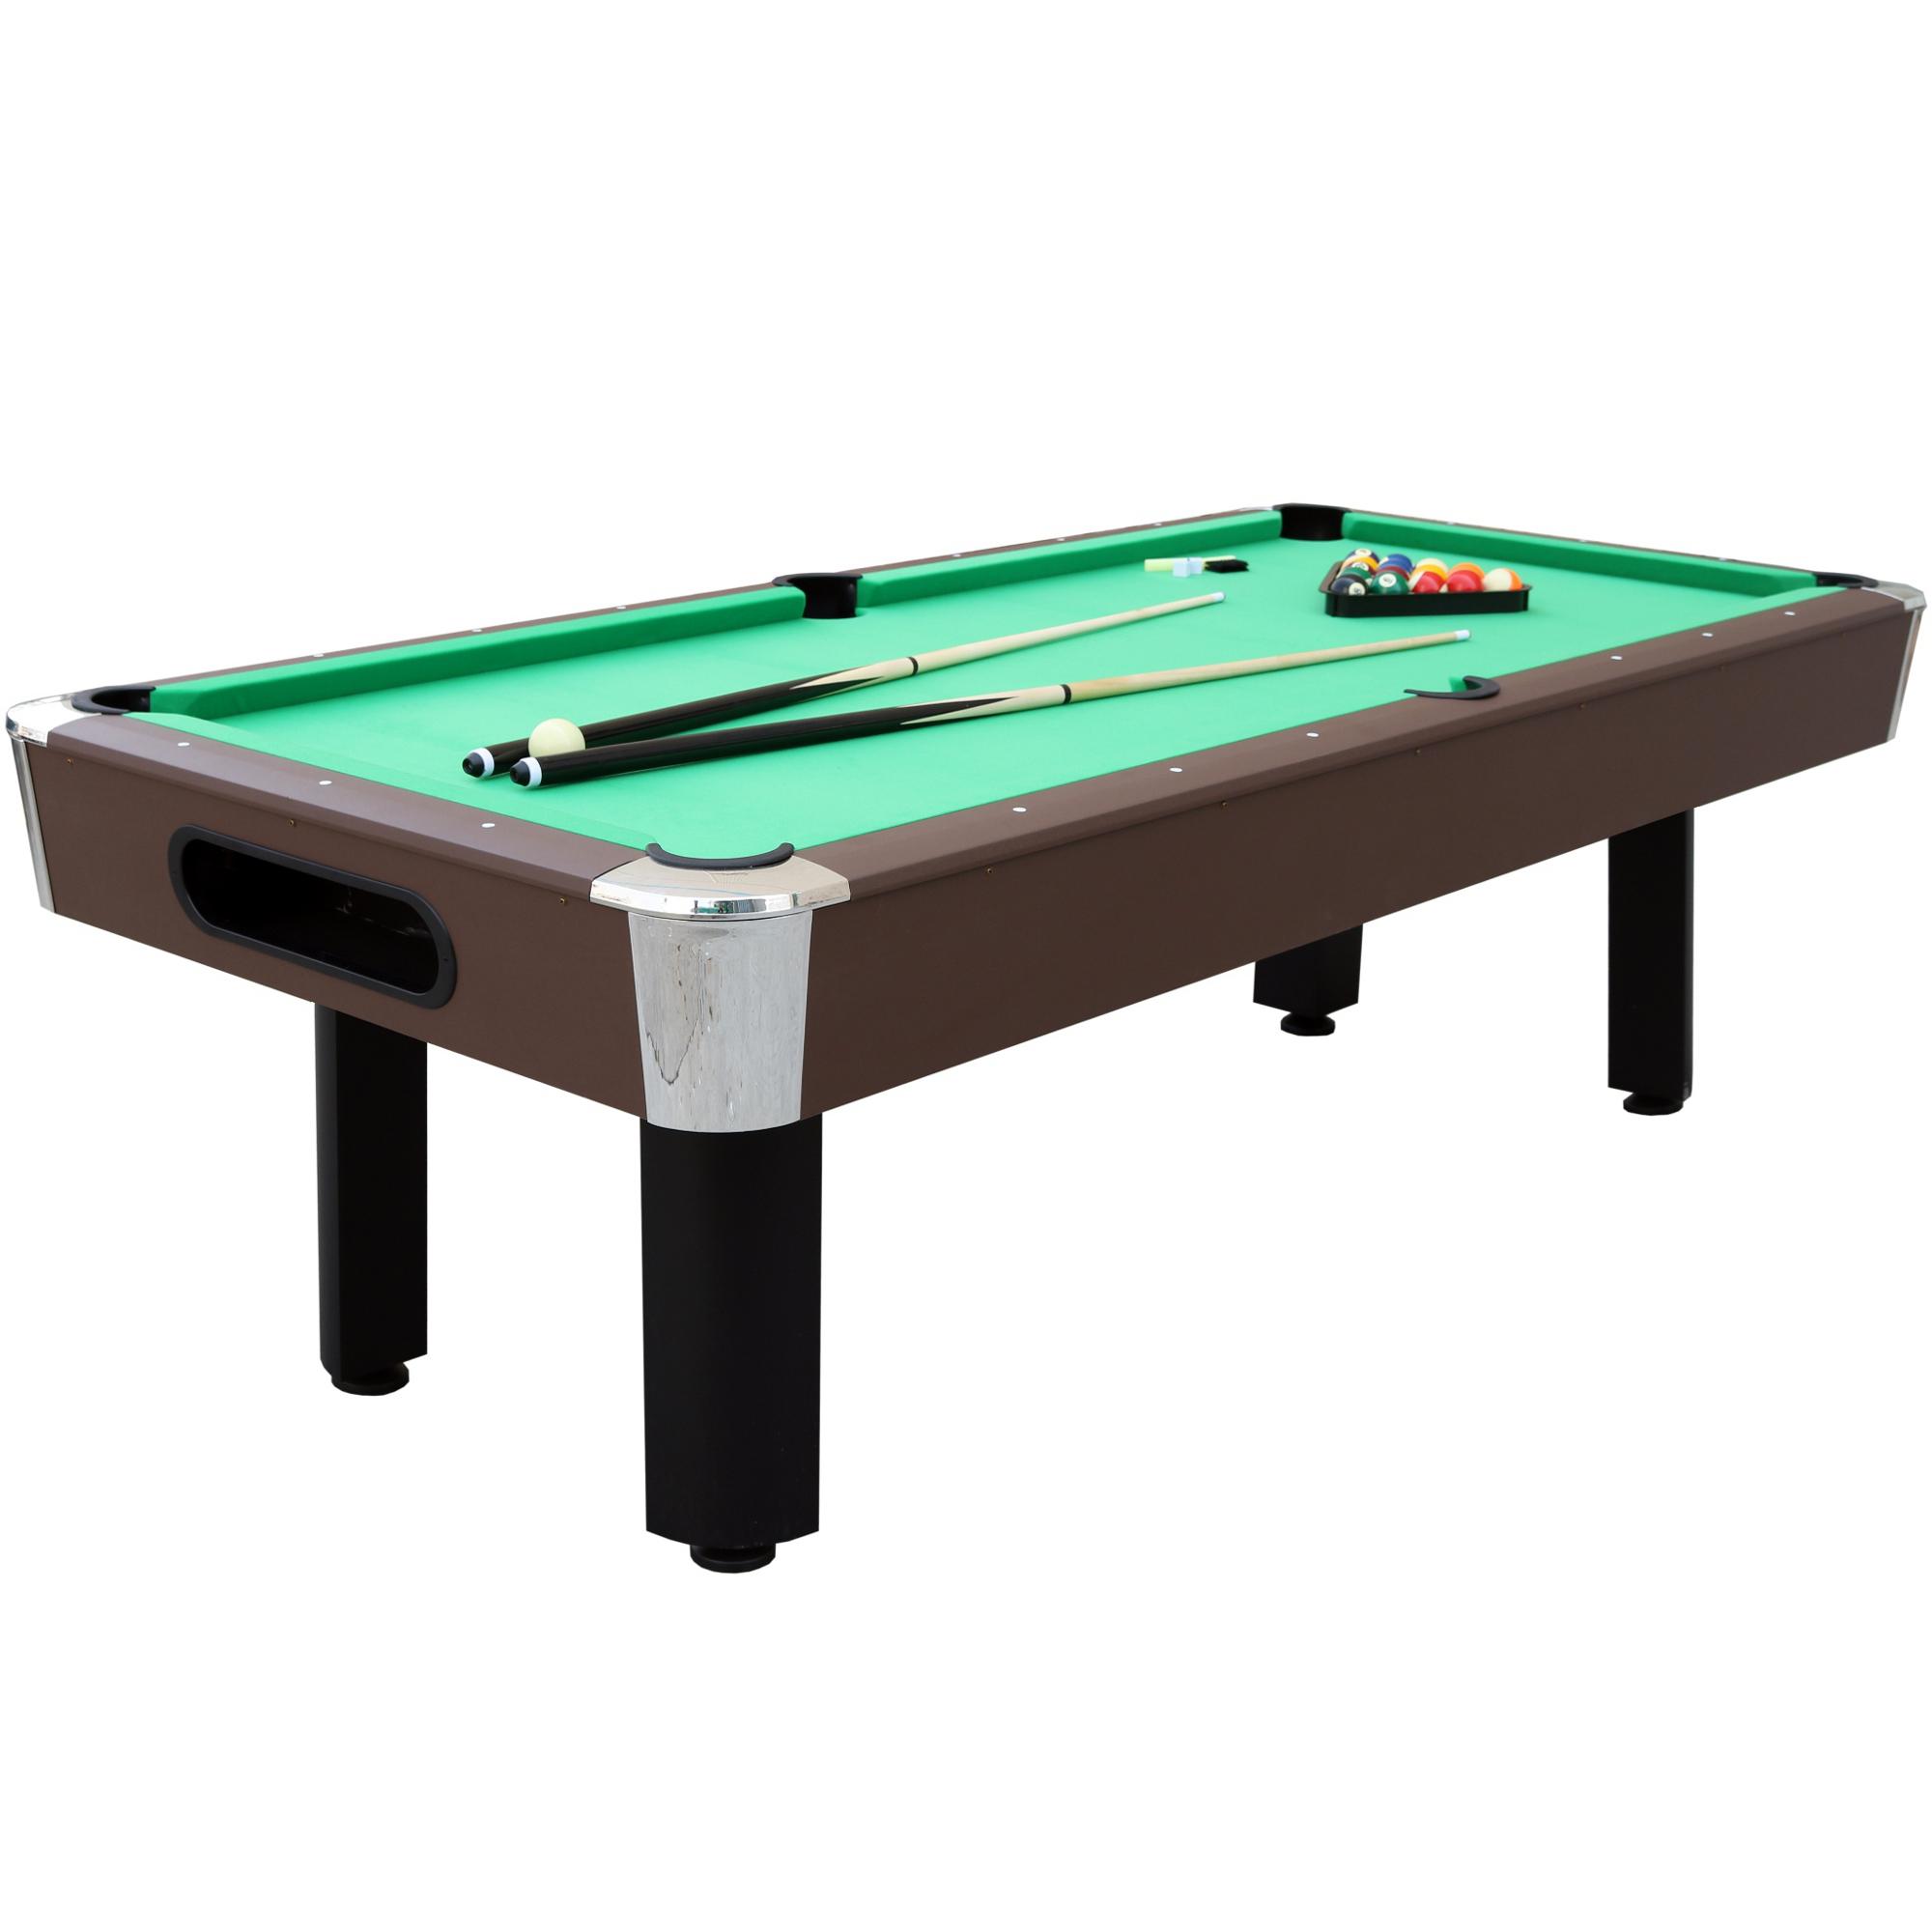 """""""Sportcraft Bayshore 96"""""""" Green Billiard Table w/ Arcade Style Ball Return & Table Tennis Top, Espresso"""""" im test"